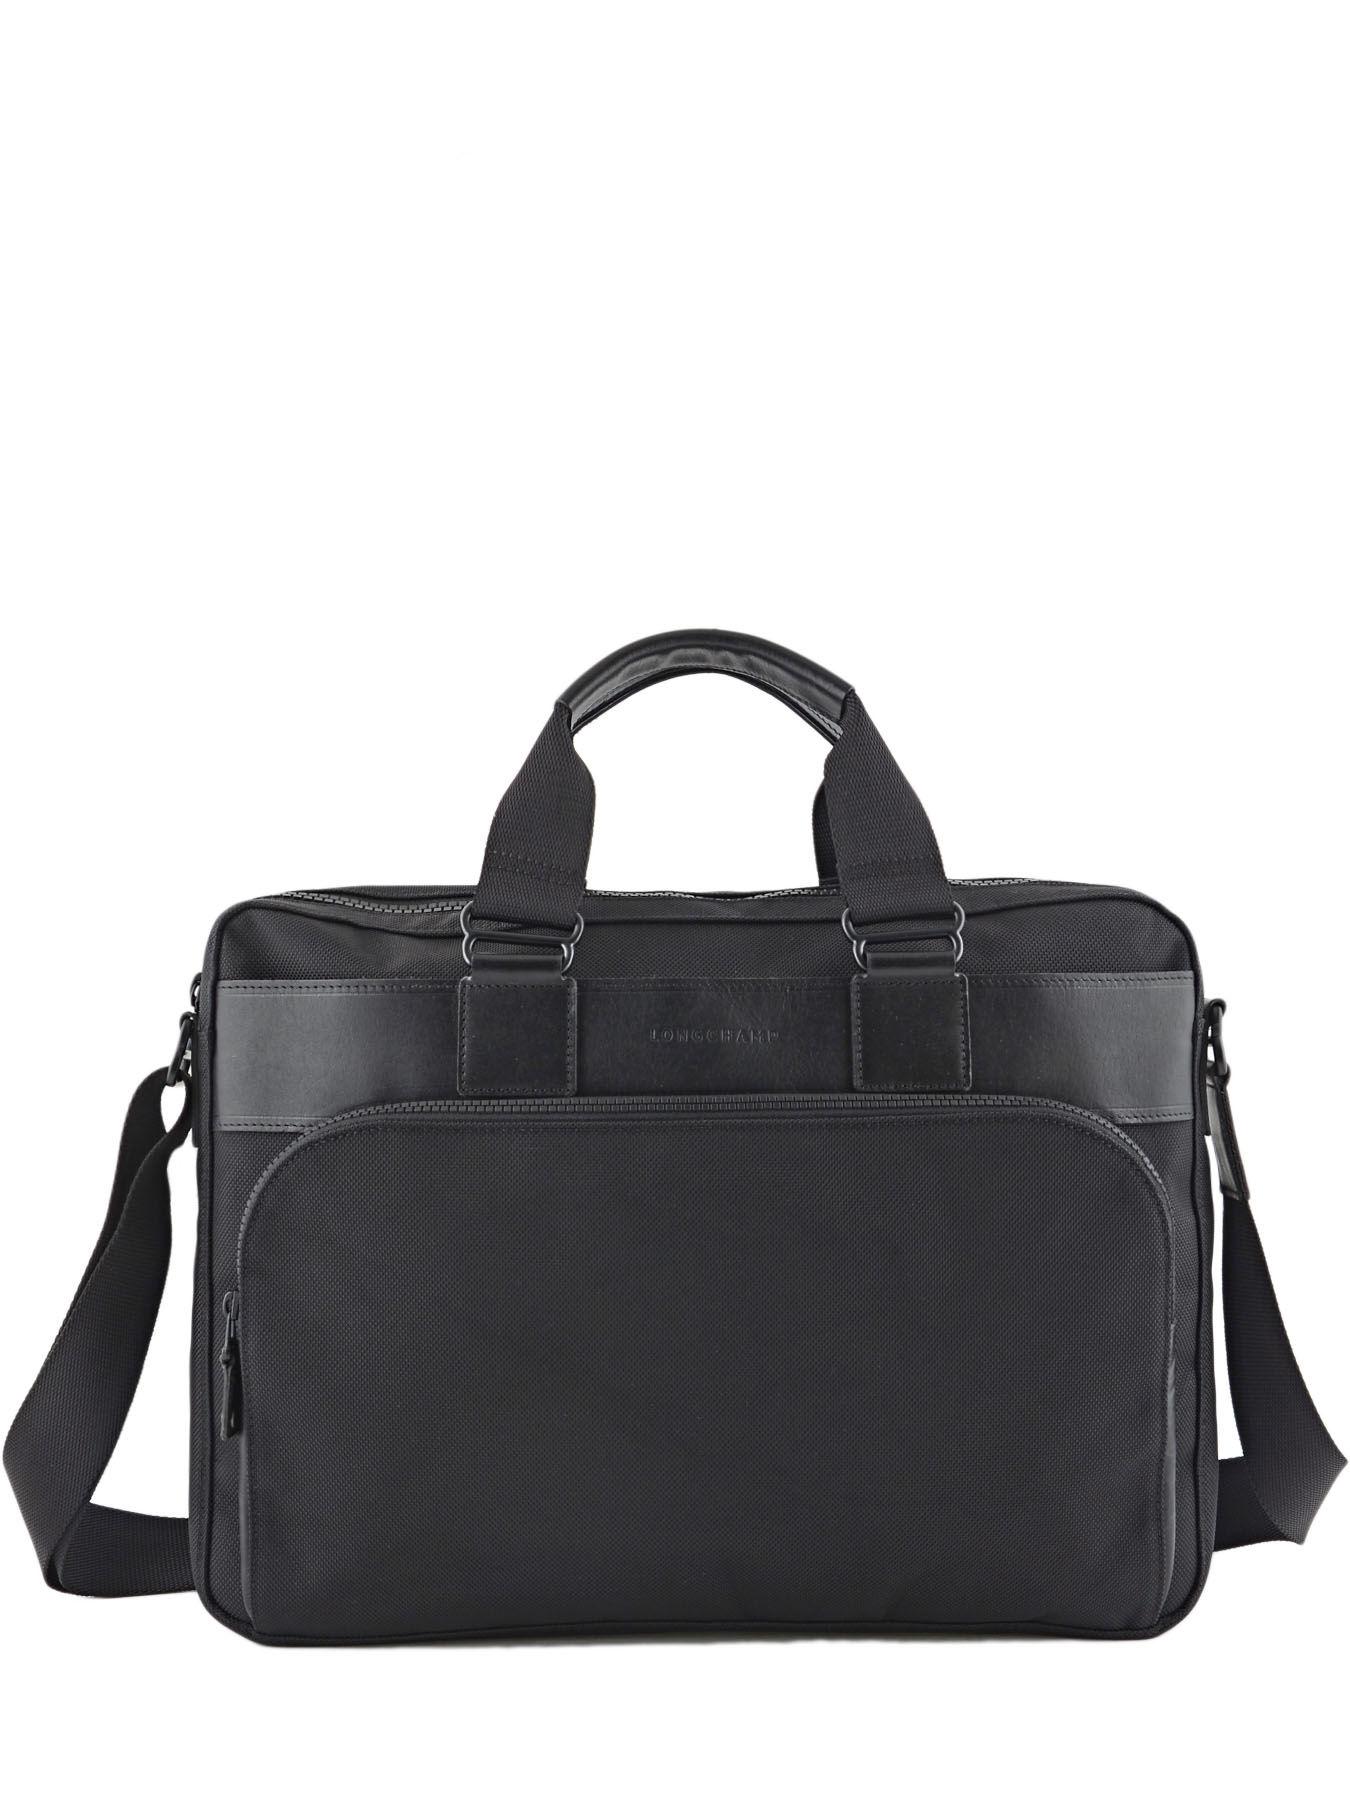 Longchamp NYLTEC Briefcase Black